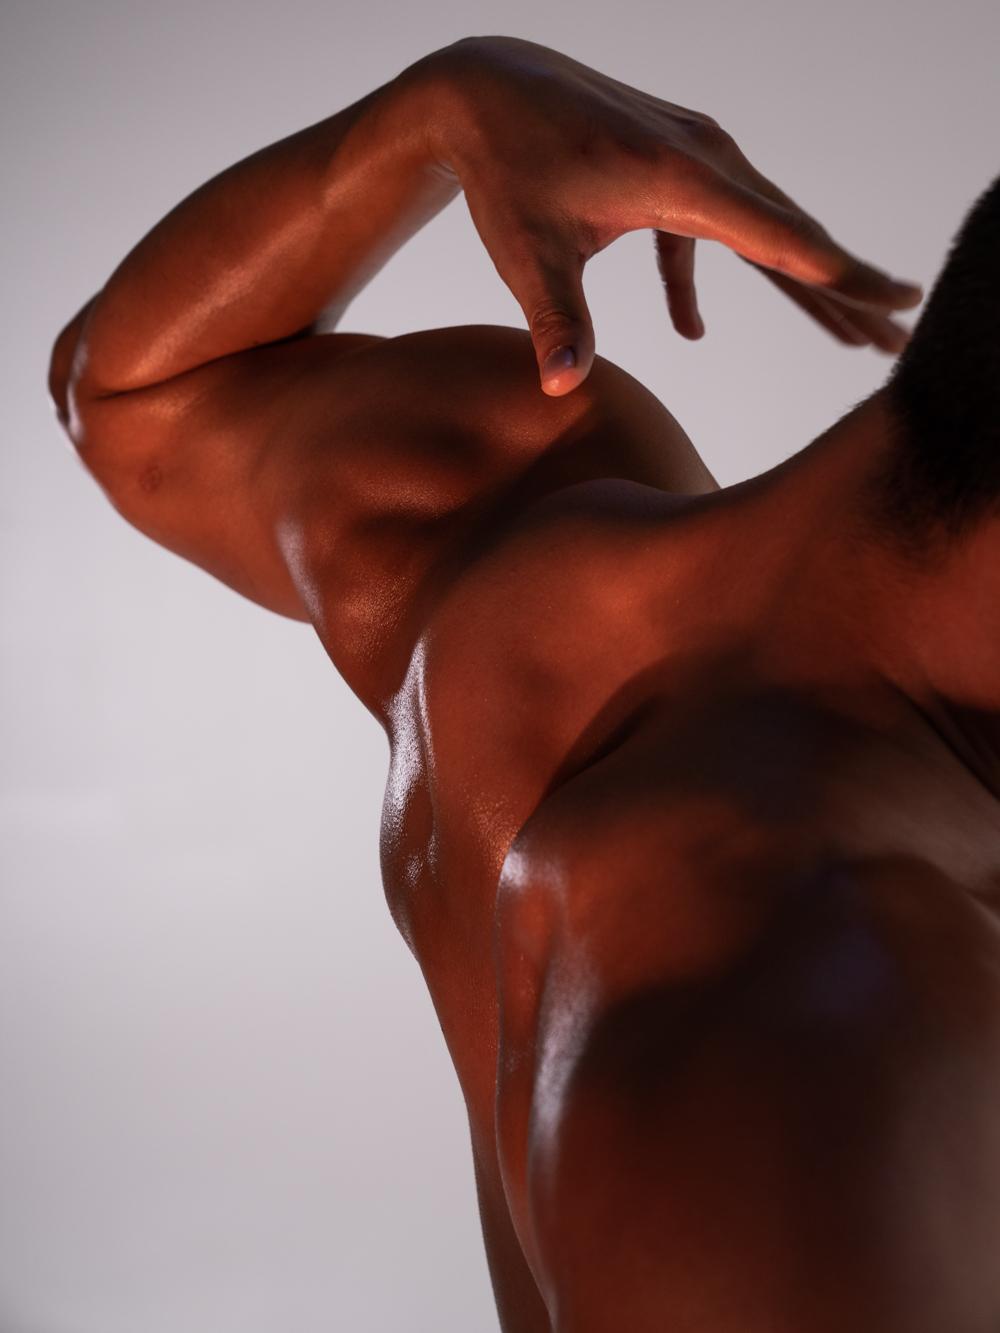 Ближе к телу: специальная съемка Louis Vuitton x BURO. (фото 2)